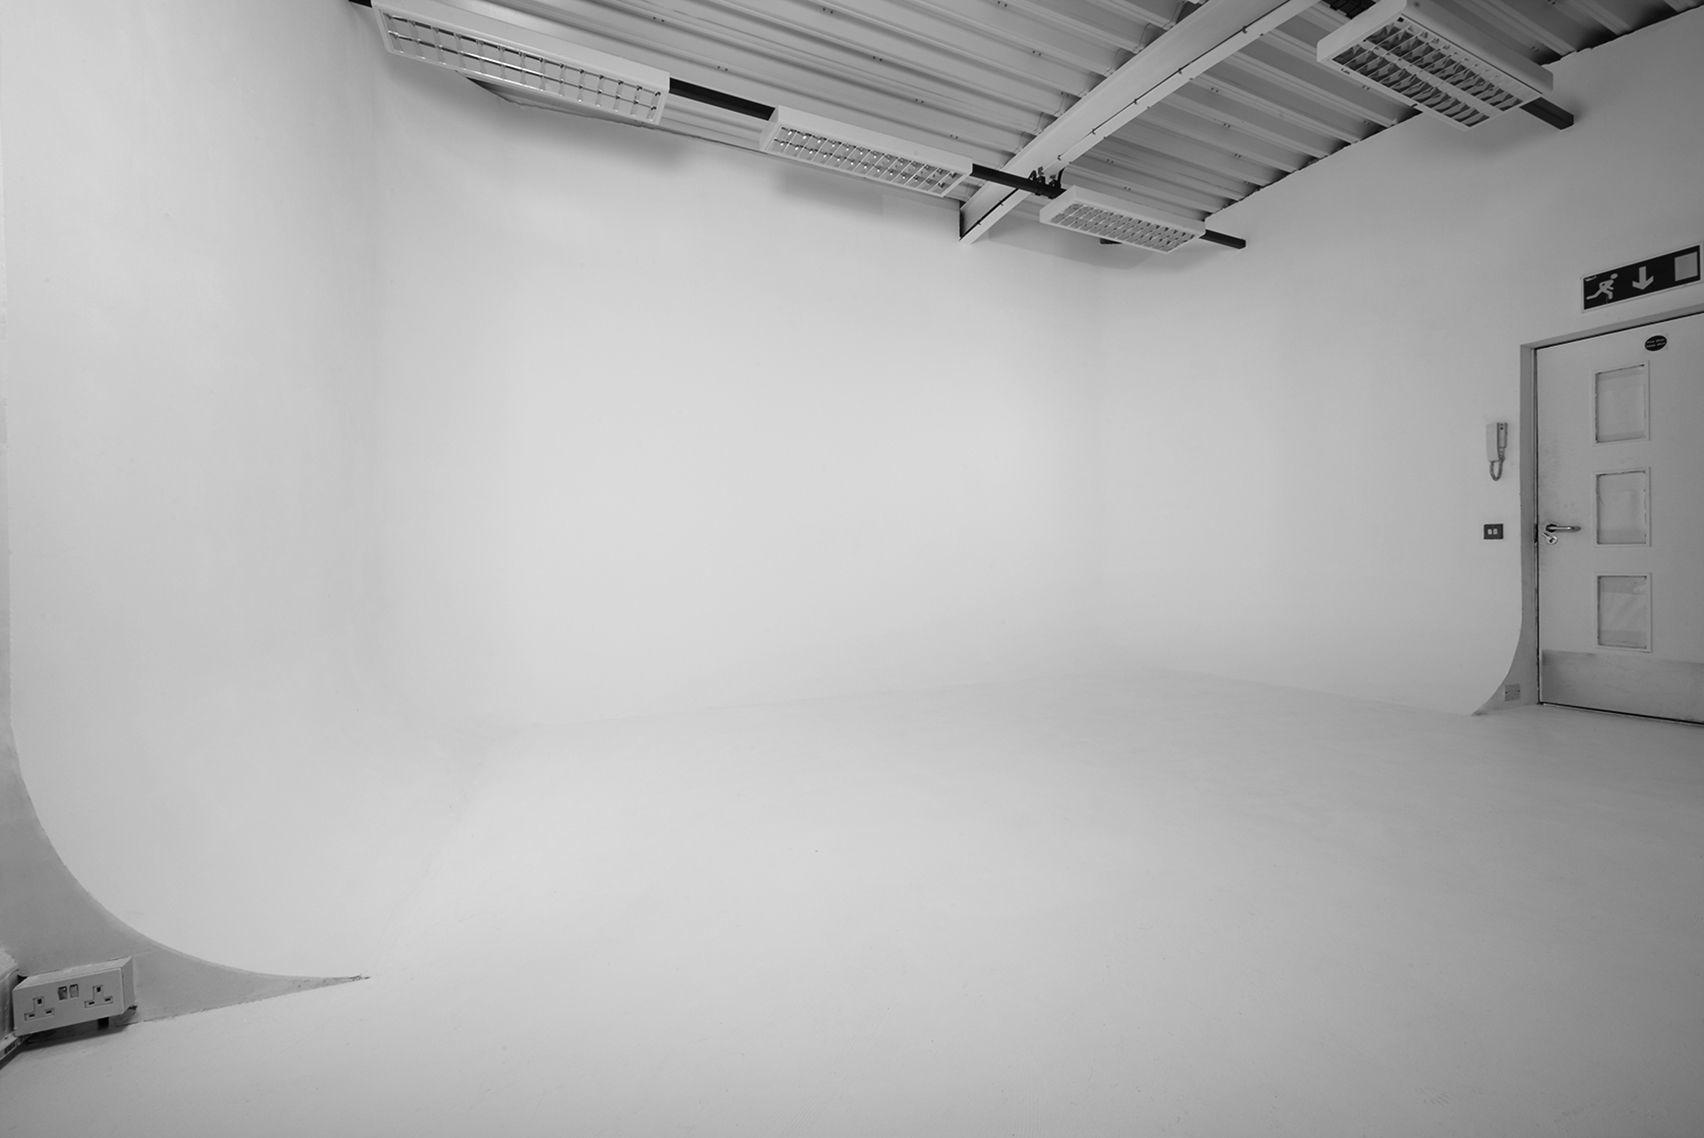 D10 Studios, Photography & Film Studio Hire